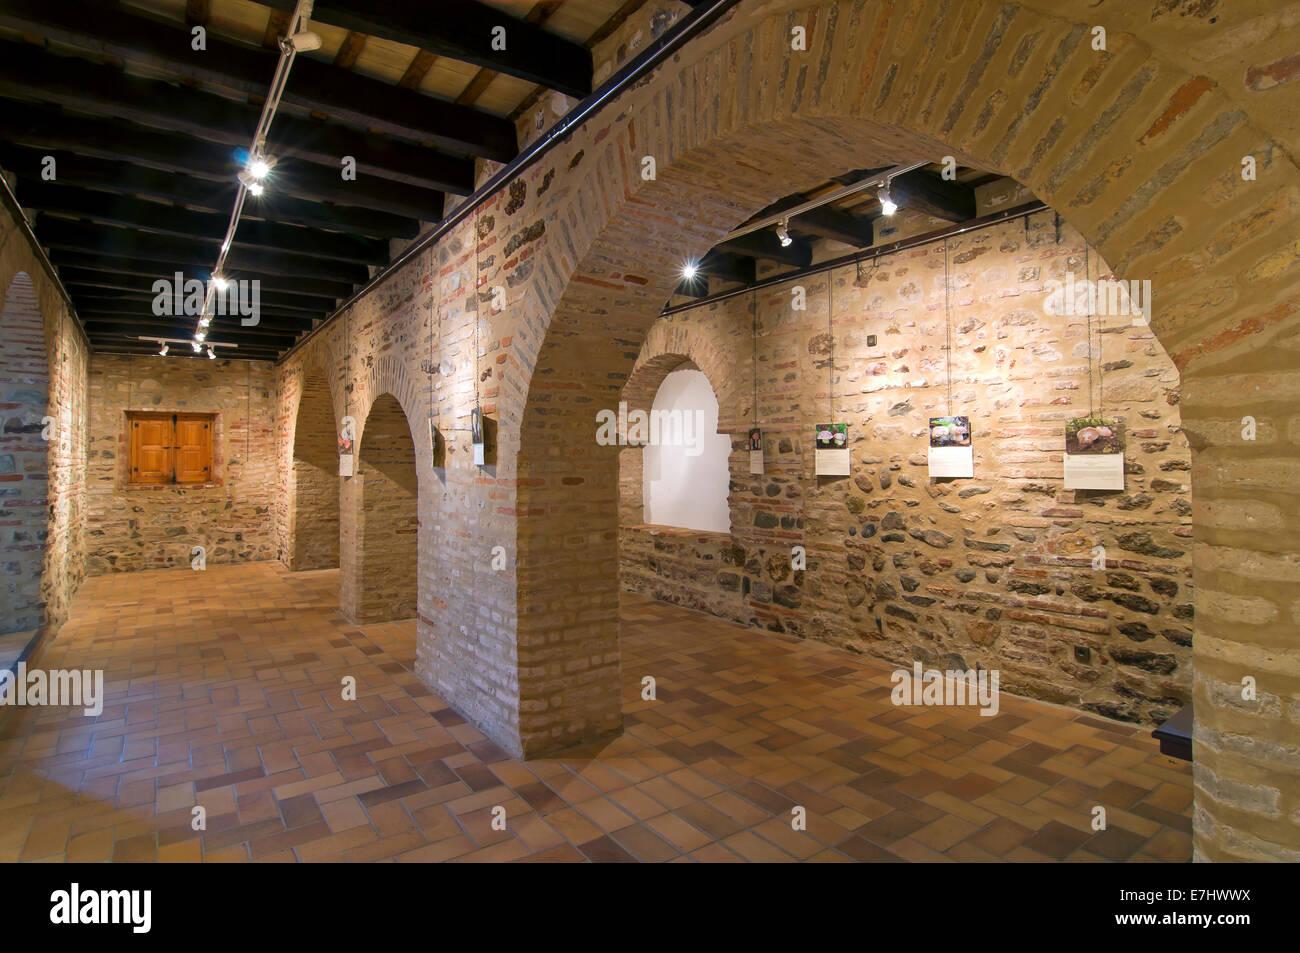 Mudejar room -15th century, Town hall, La Redondela, Huelva province, Region of Andalusia, Spain, Europe - Stock Image